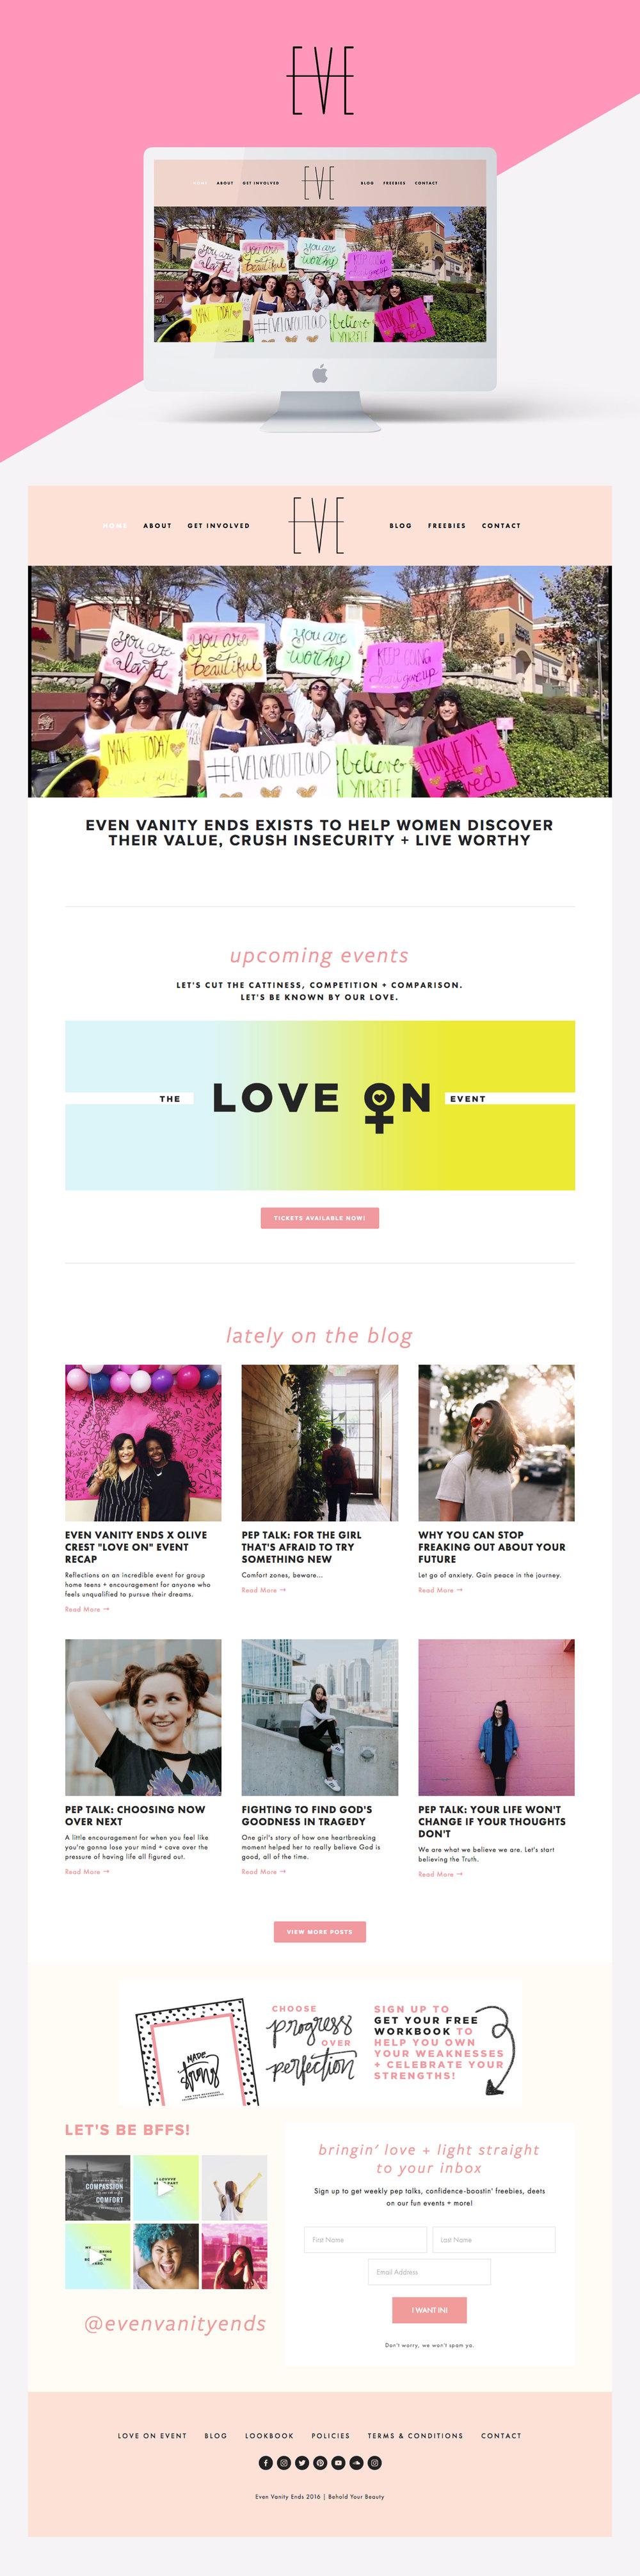 beyond-the-blvd-design-custom-website-even-vanity-ends.jpg